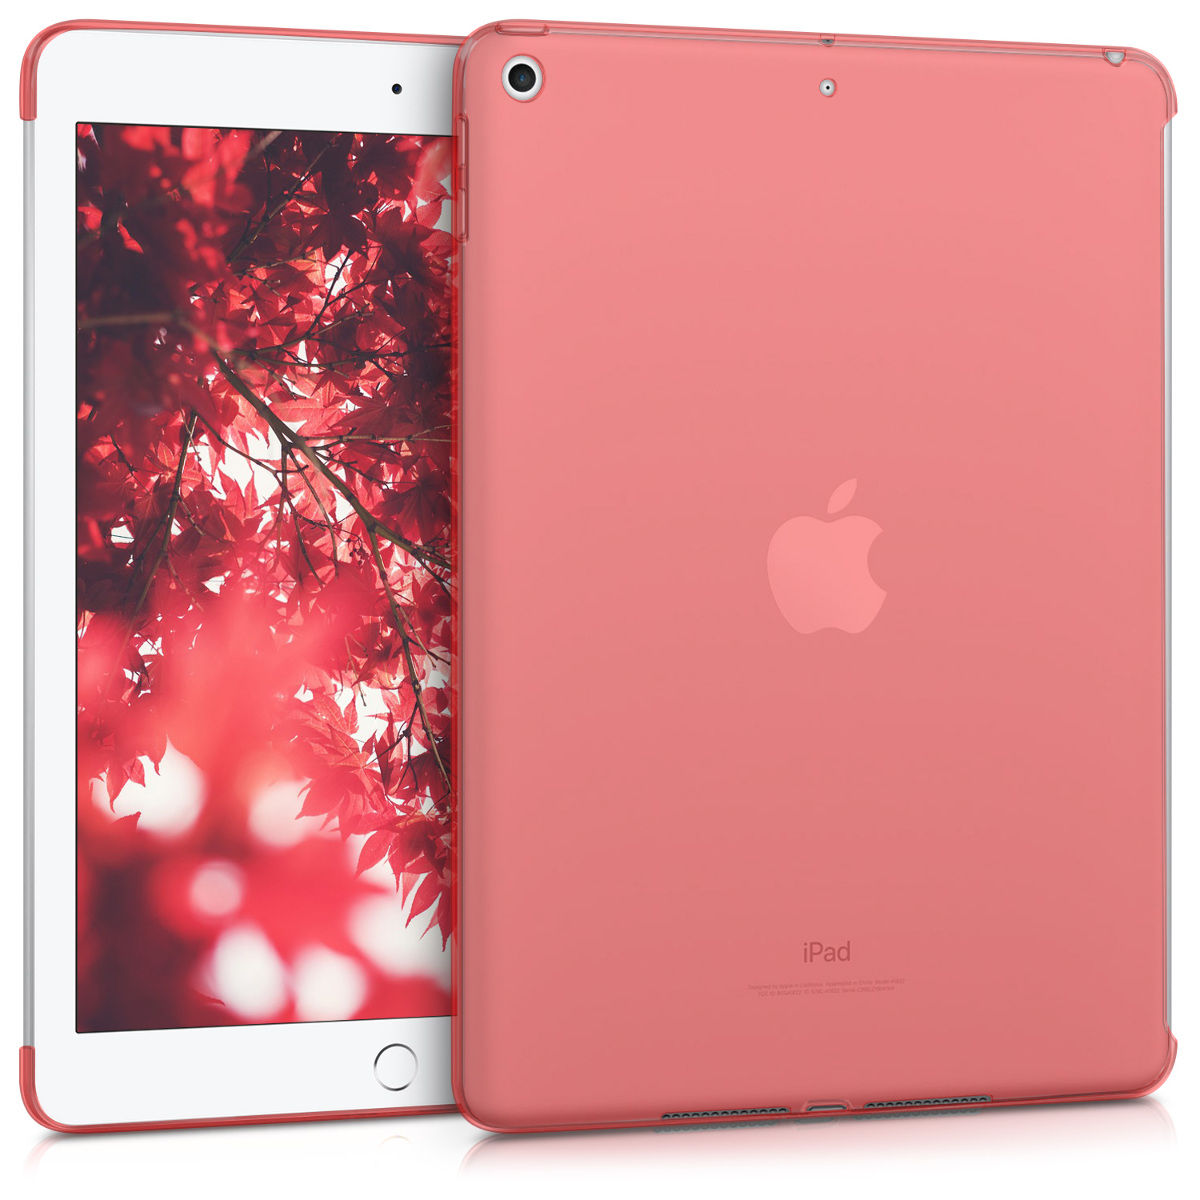 KW Θήκη Σιλικόνης Apple iPad 9.7 (2017 / 2018) - Red / Transparent (41737.09)